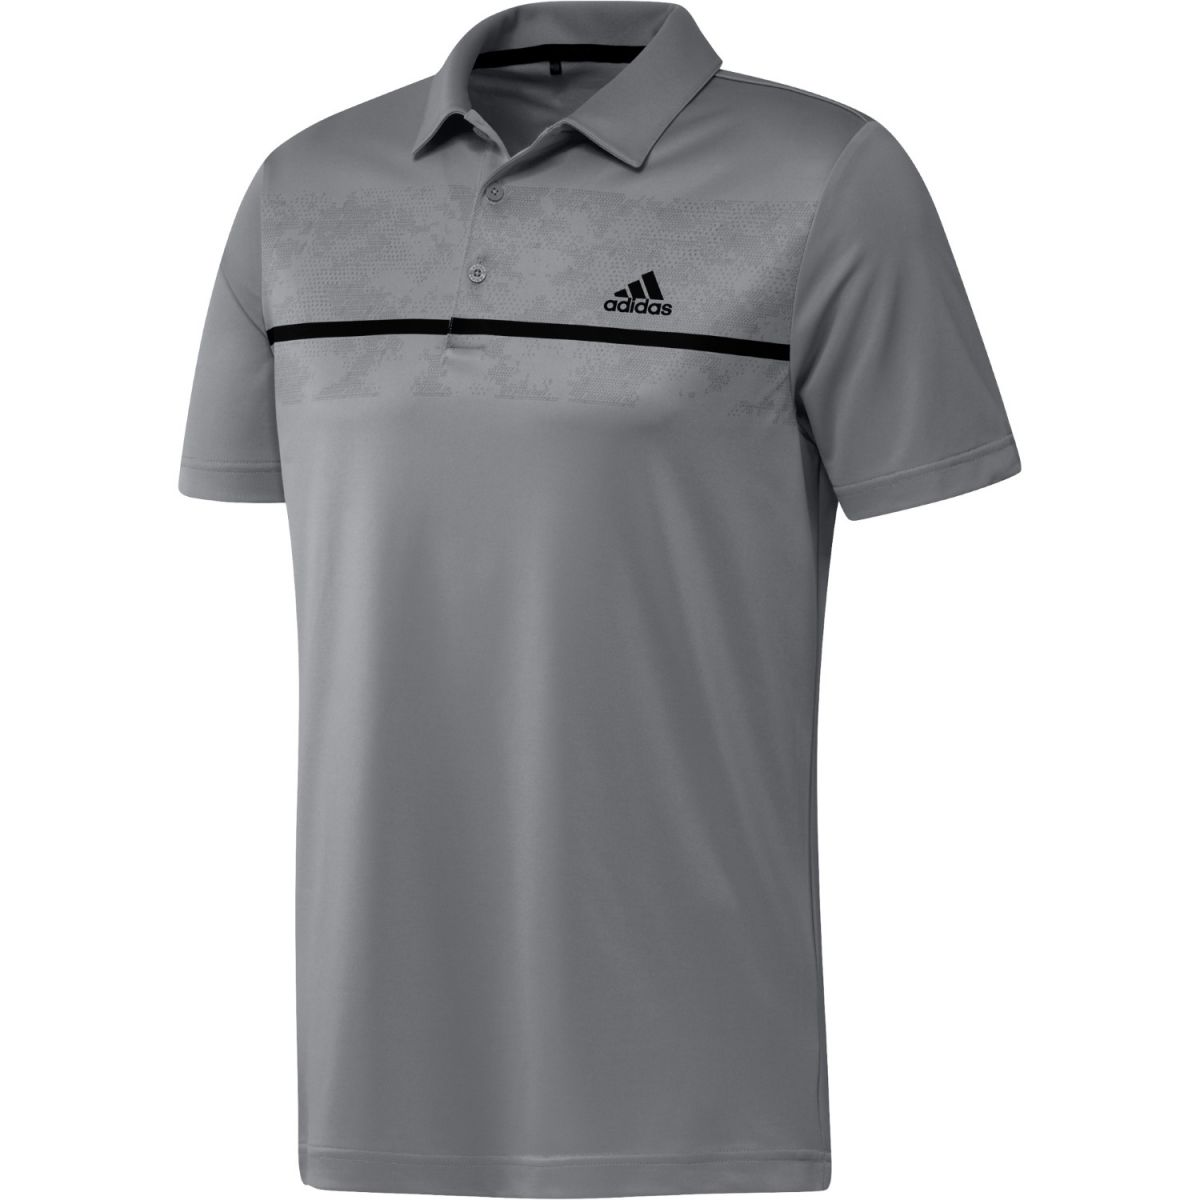 adidas polo chest print grey s